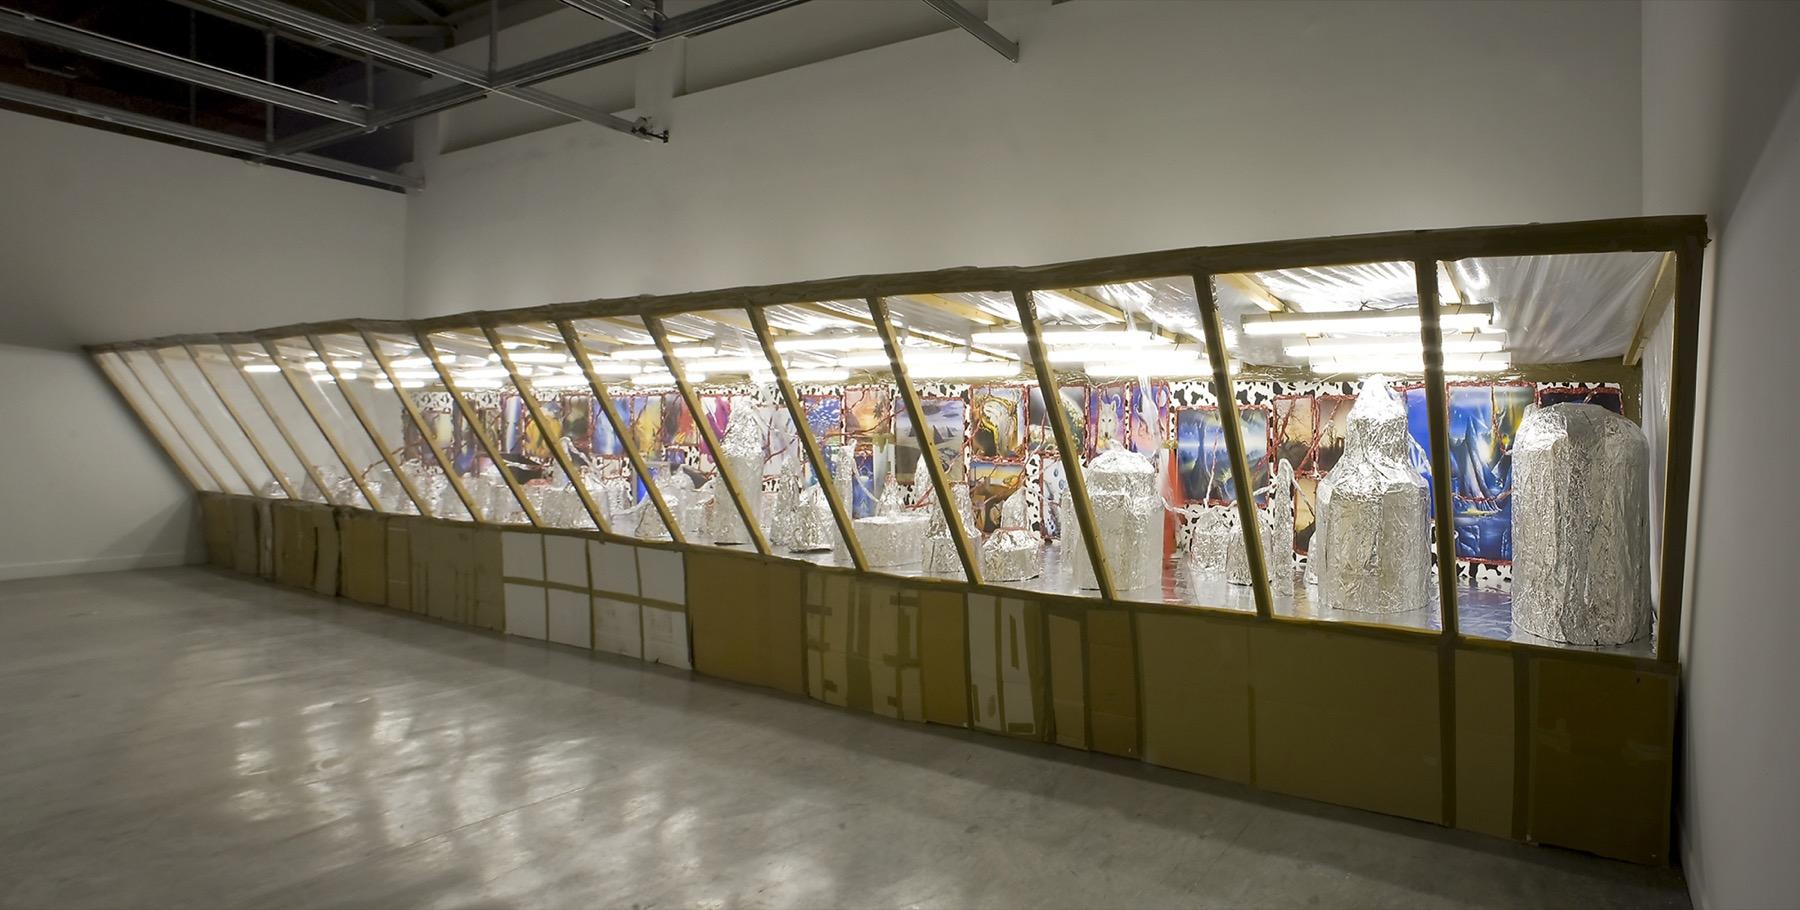 Thomas Hirschhorn Diorama Ica Miami